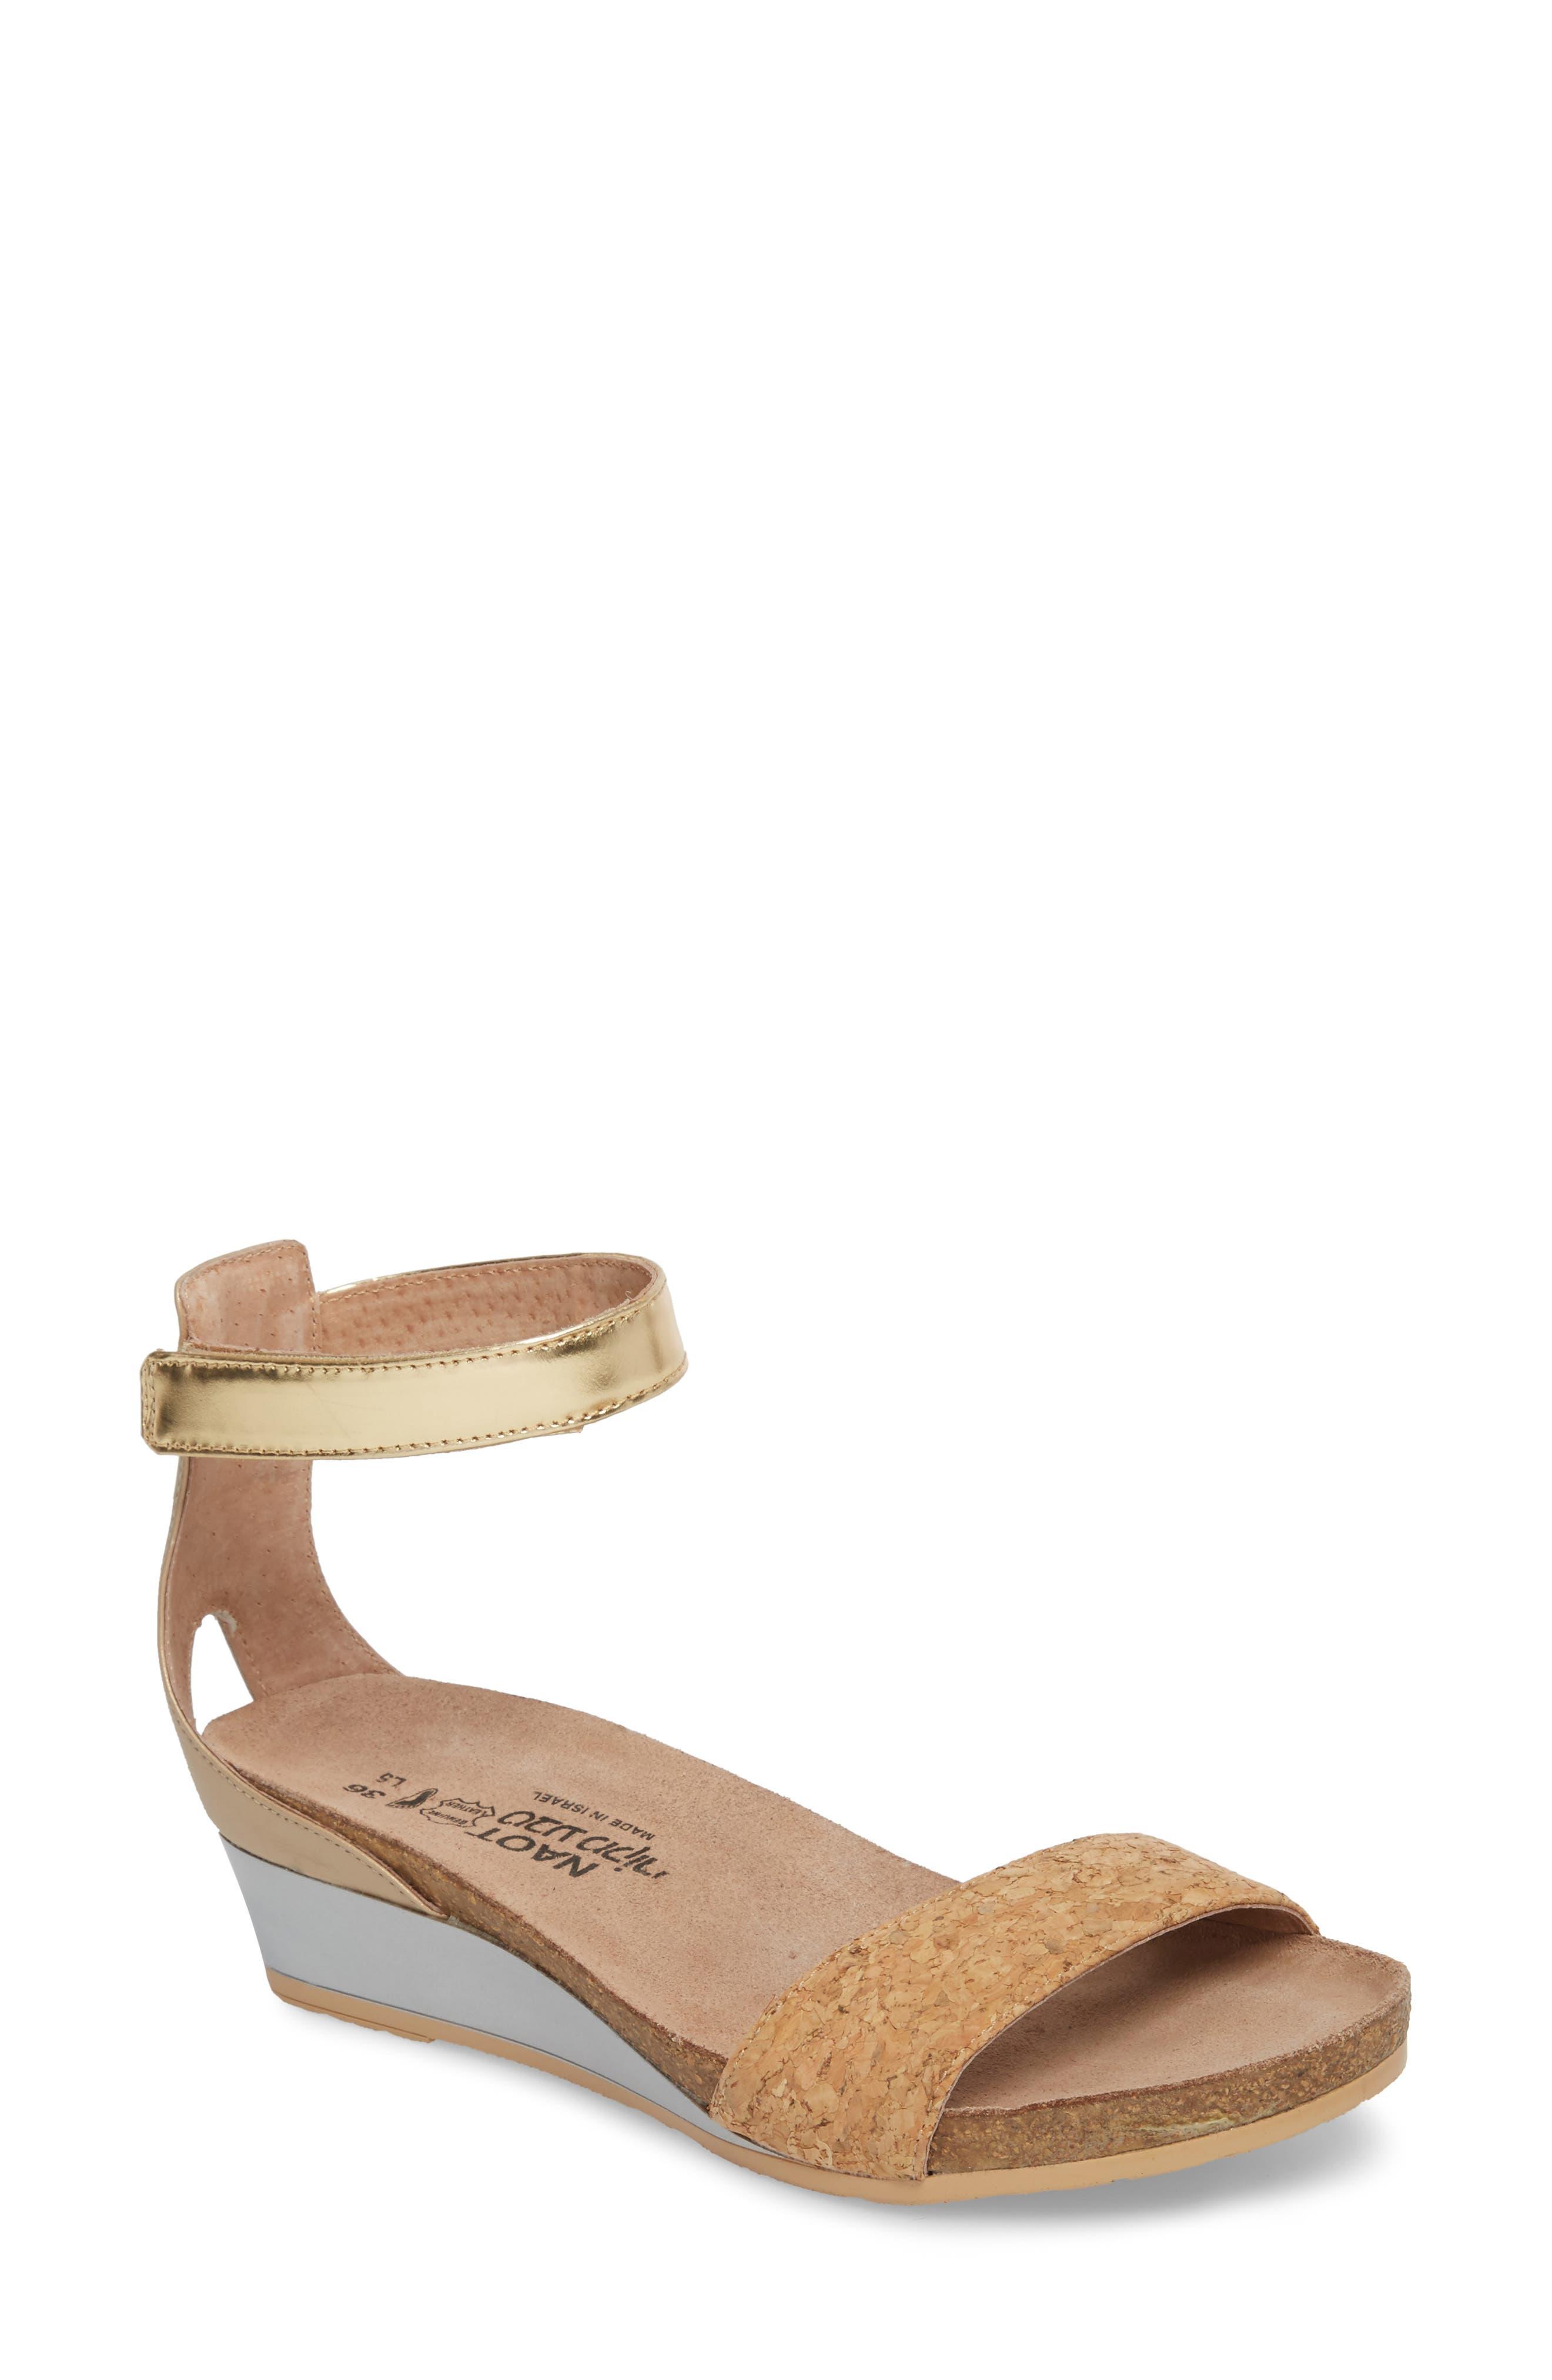 Main Image - Naot 'Pixie' Sandal (Women)